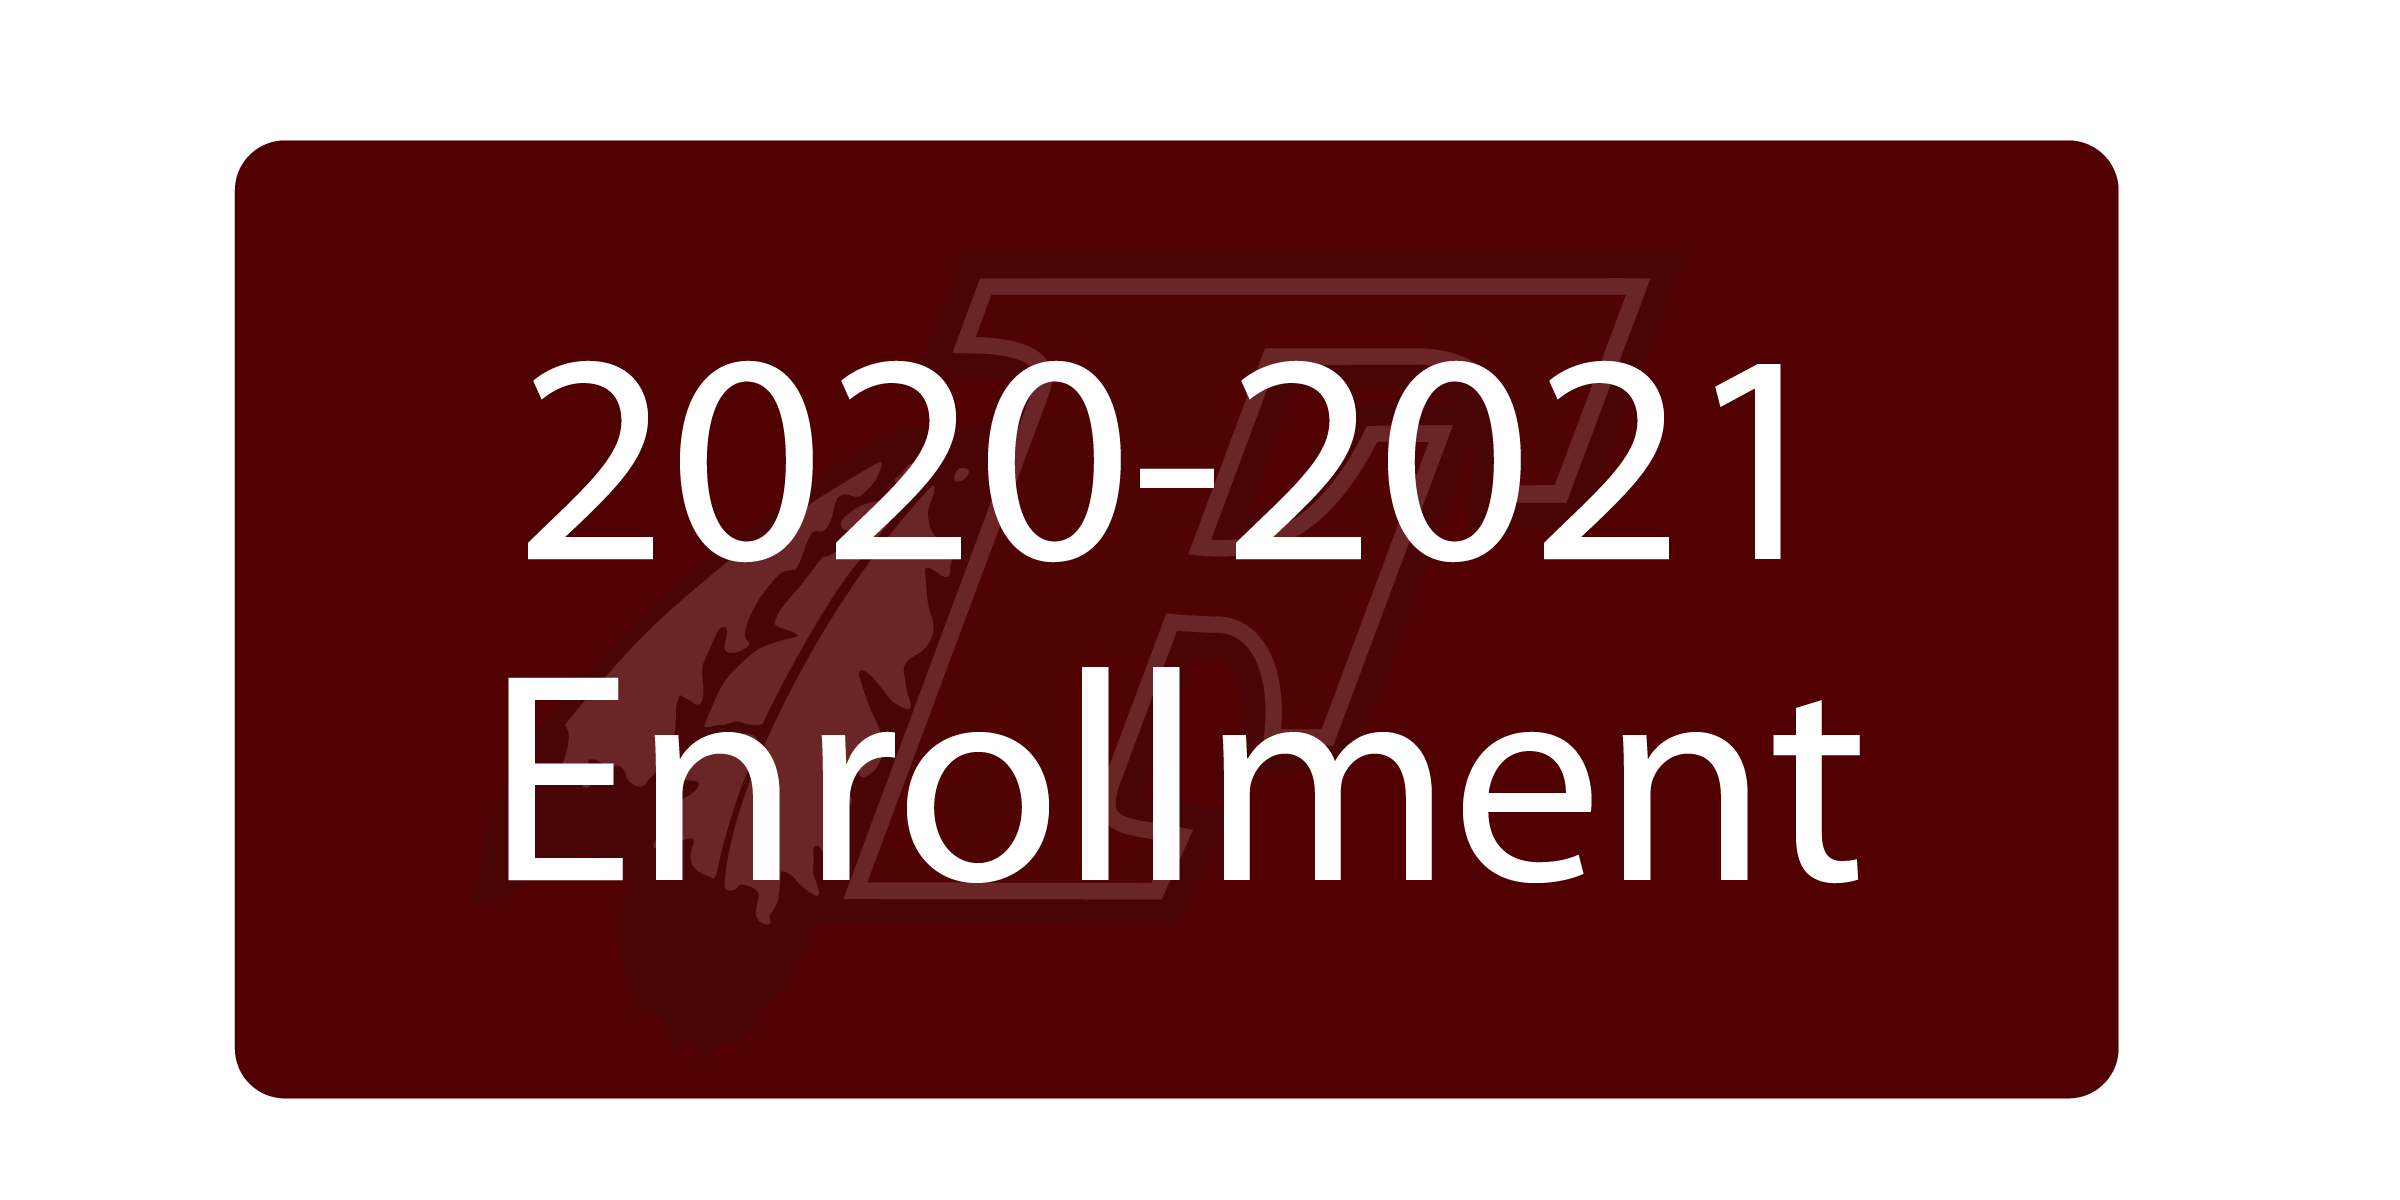 Enroll - The School District Of Menomonee Falls Intended For Menomonee Falls School District Calendar 2021